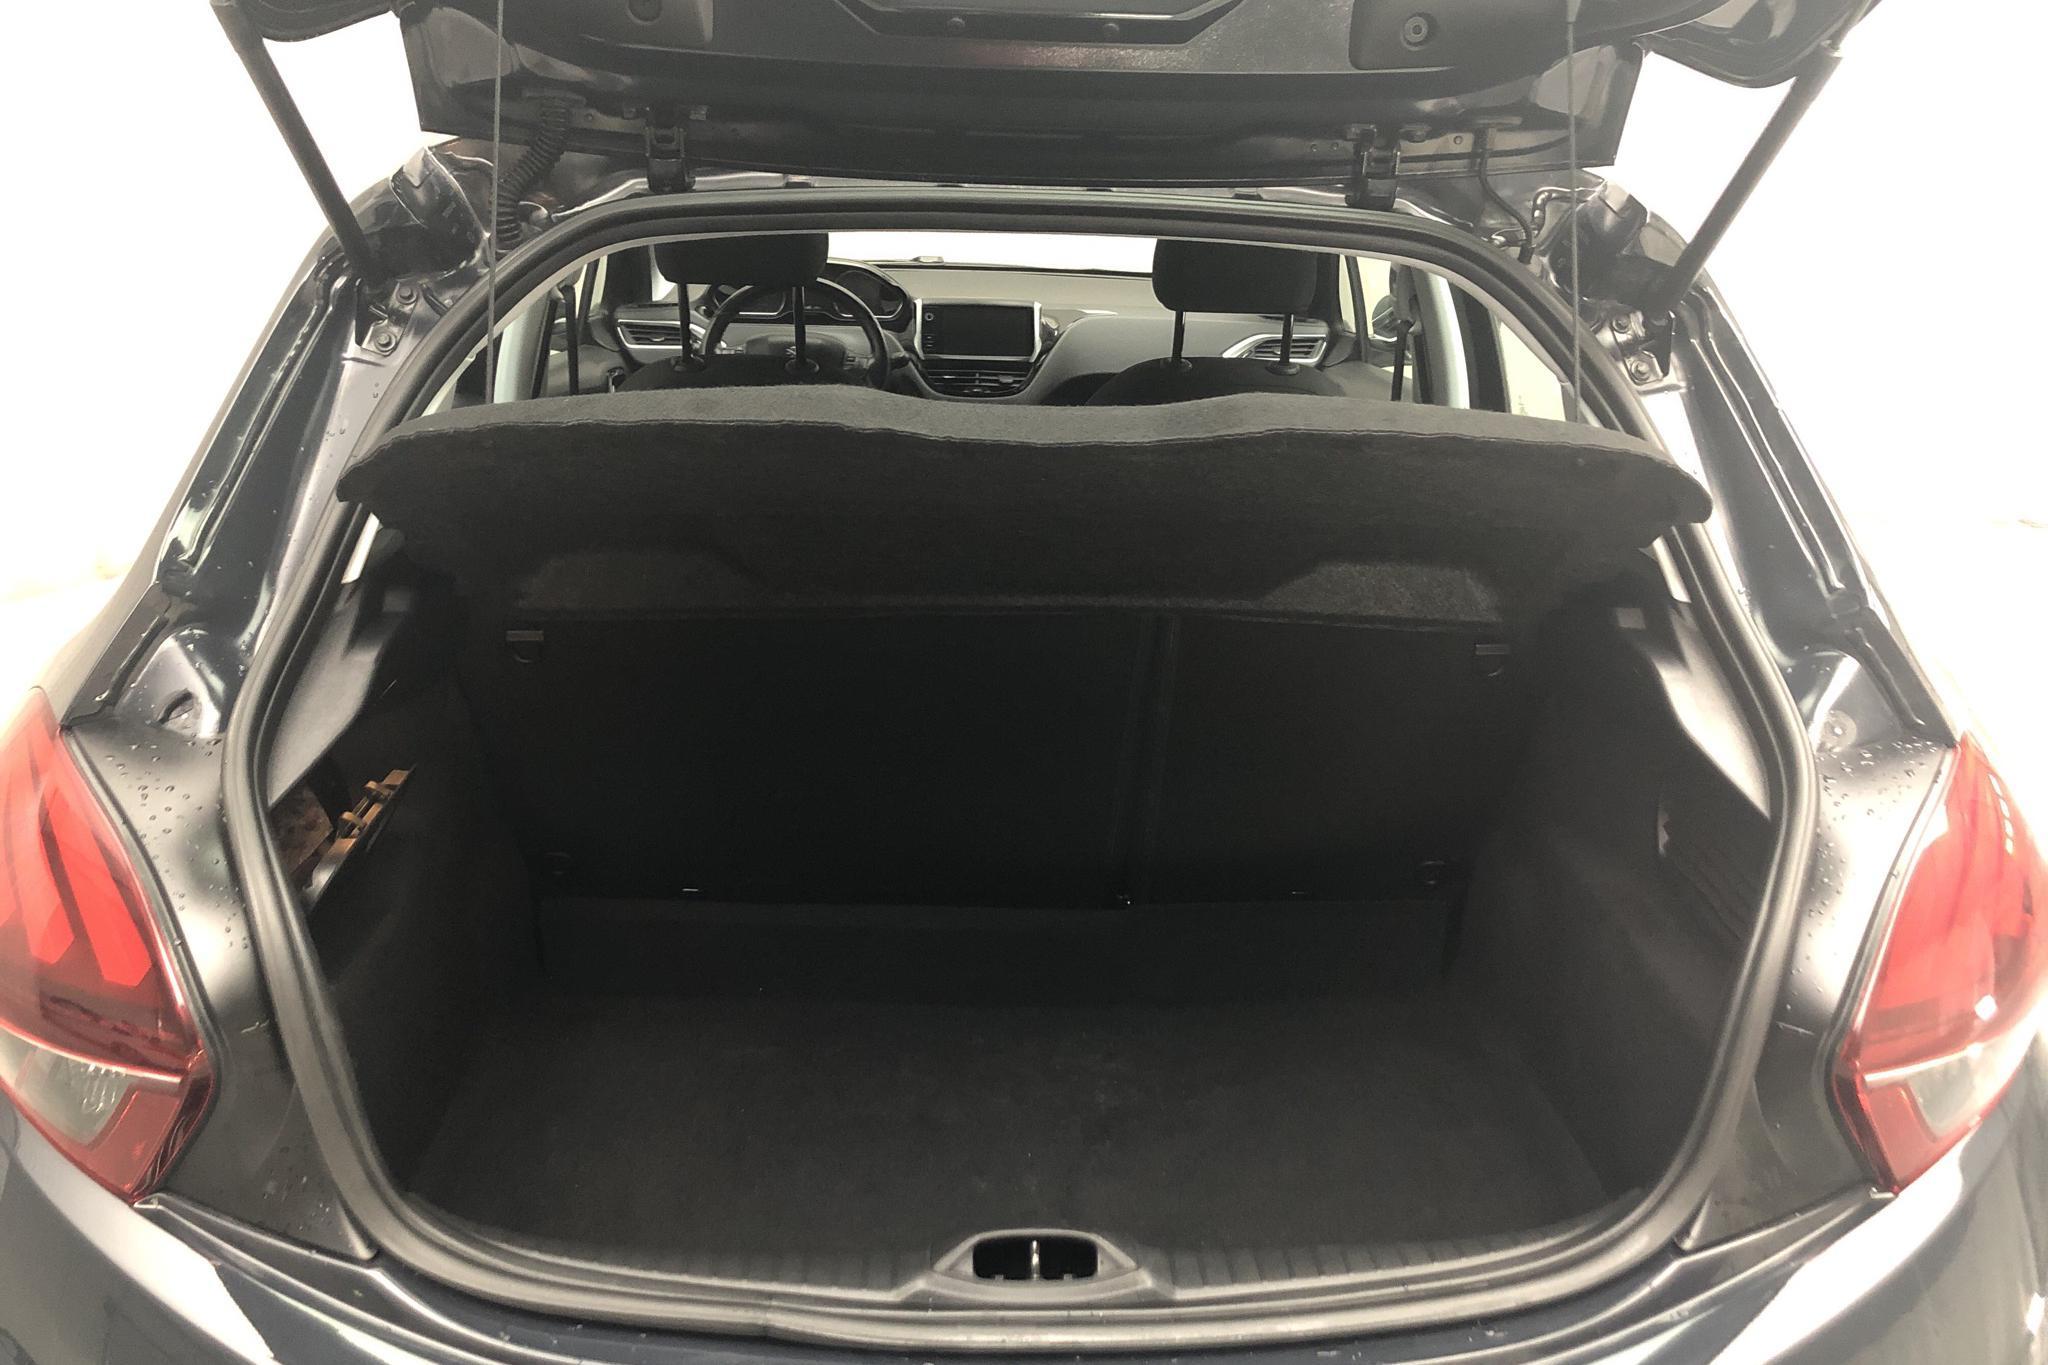 Peugeot 208 BlueHDi 5dr (100hk) - 5 335 mil - Manuell - Dark Grey - 2016